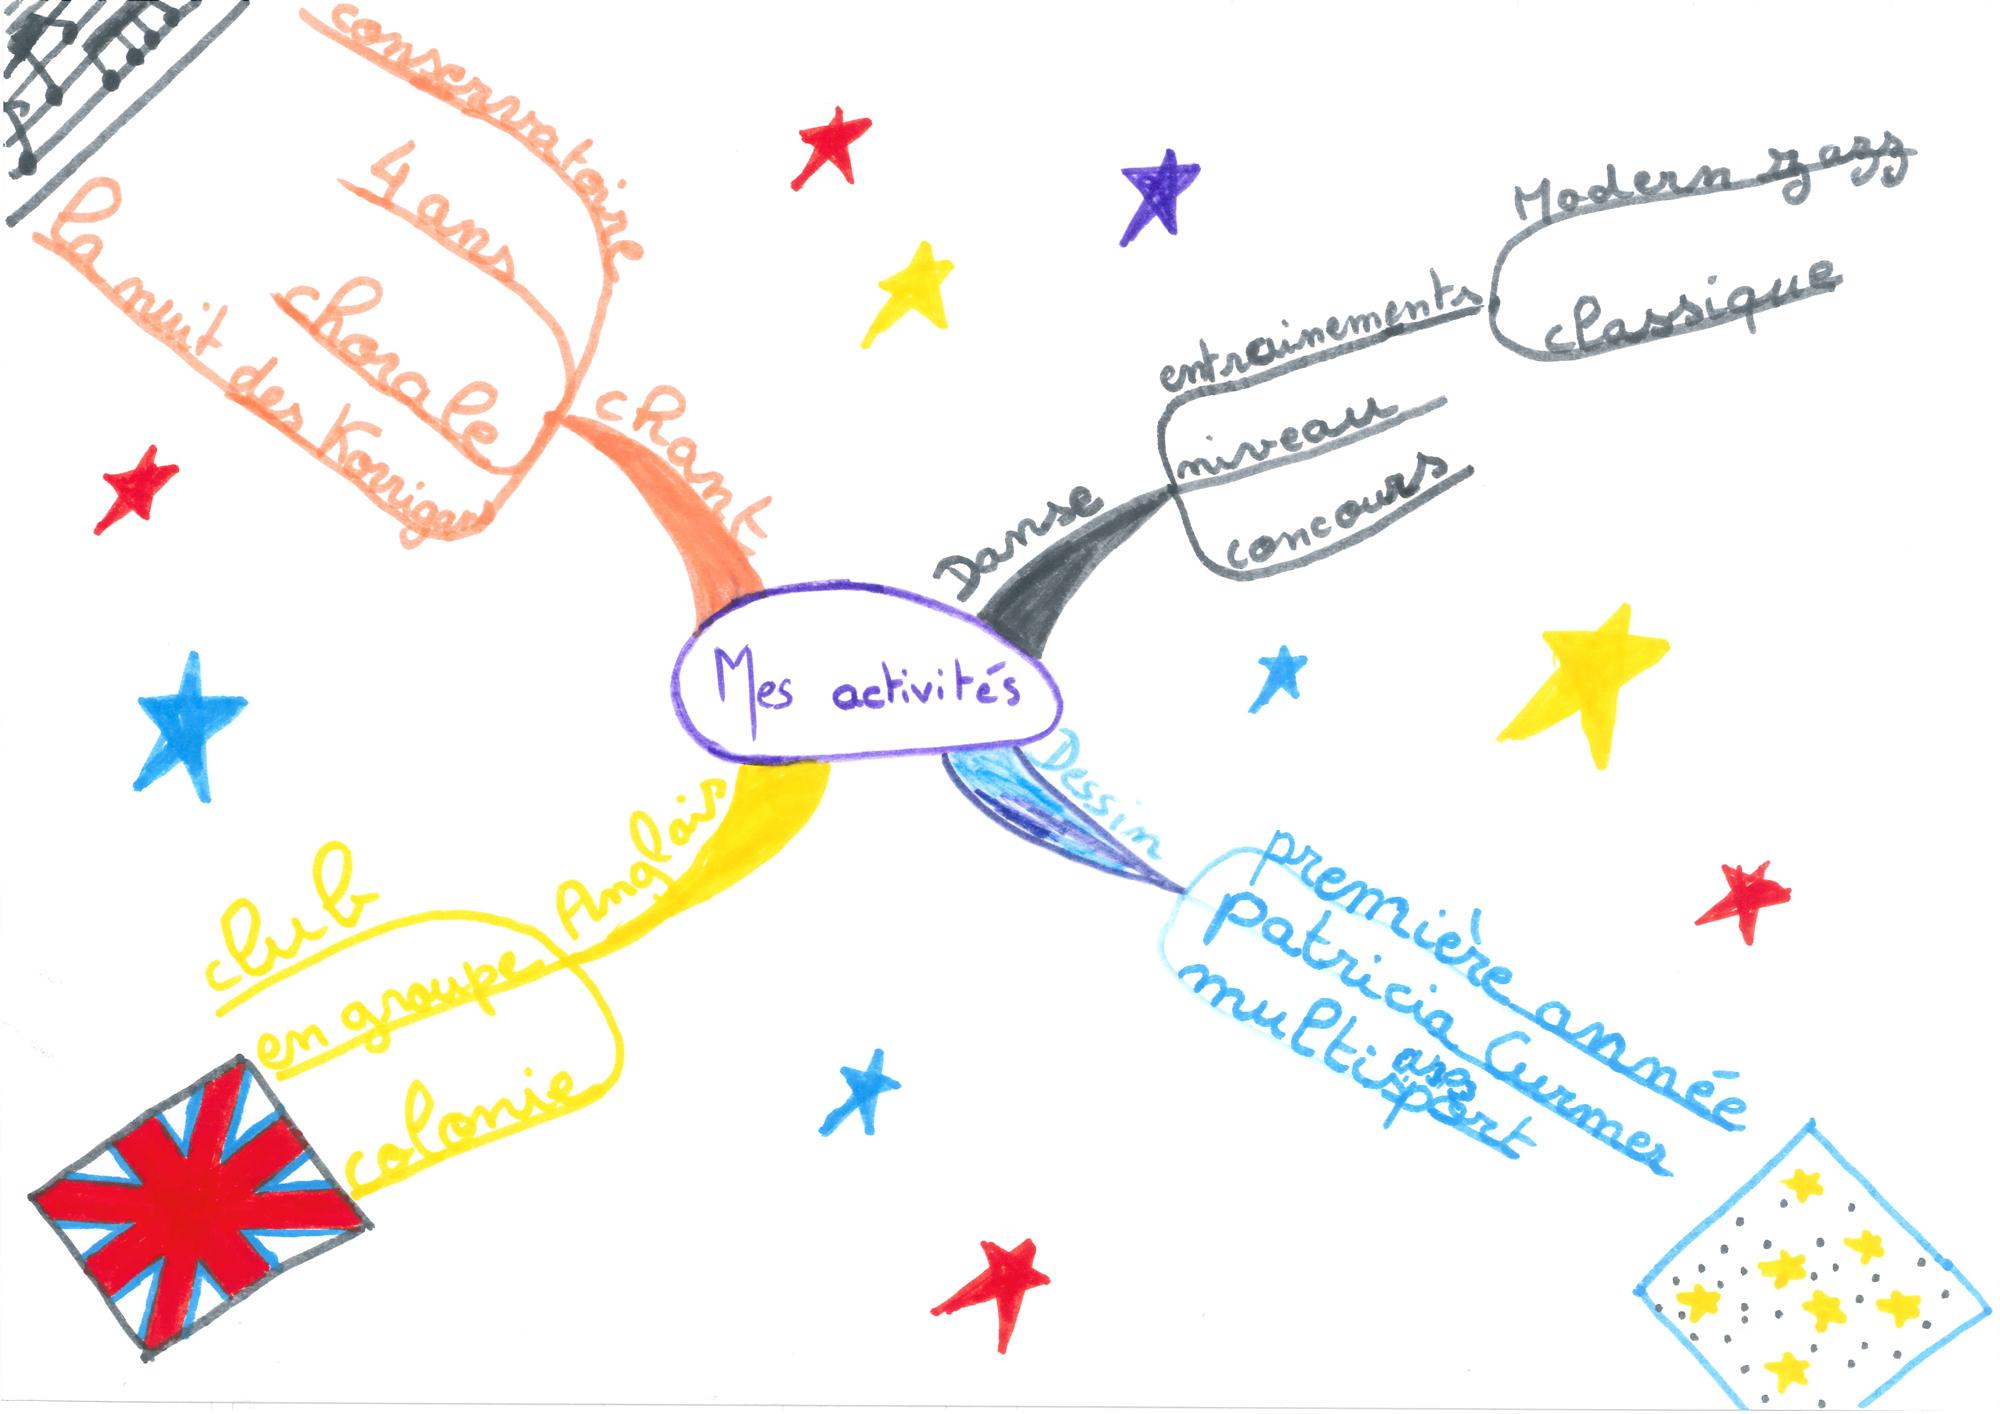 Mind-Mapping-Enfants-(Mes-activites)